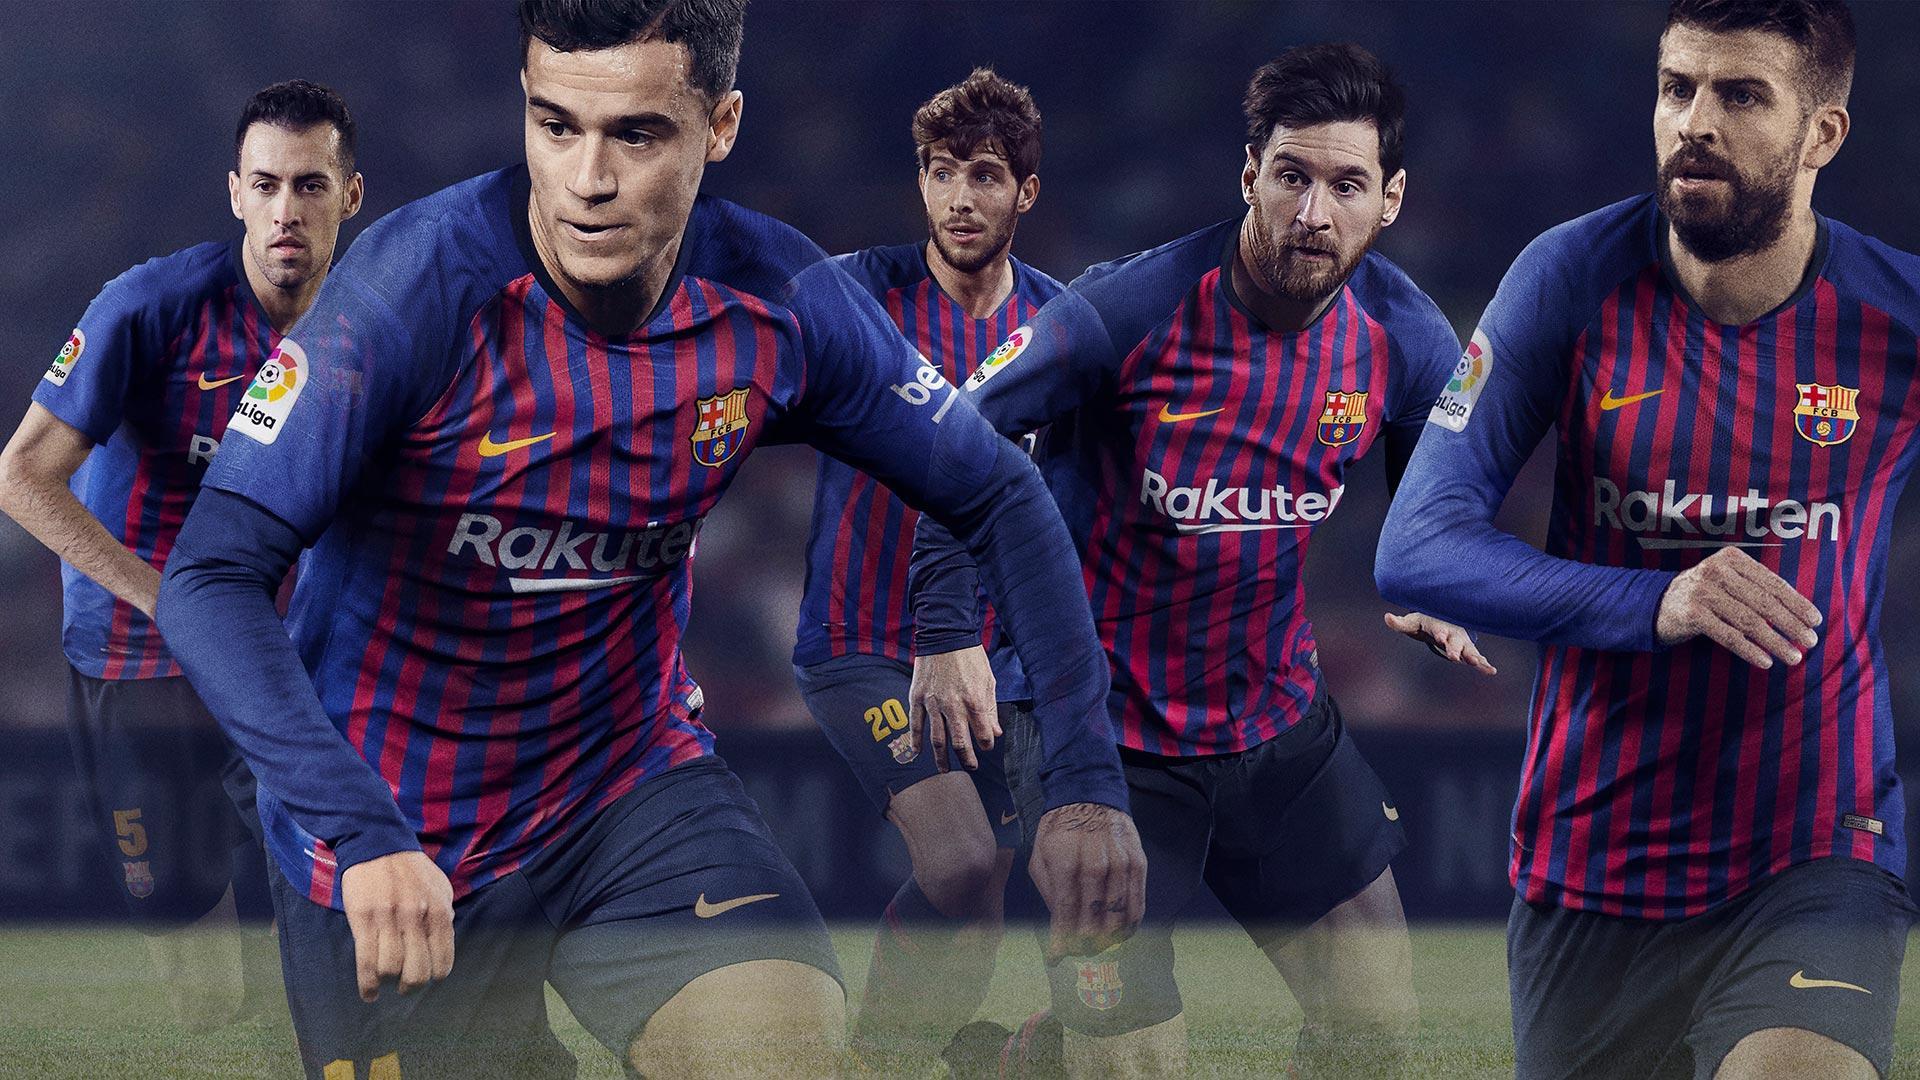 FC Barcelona unveils new Nike kit for 201819 season 1920x1080